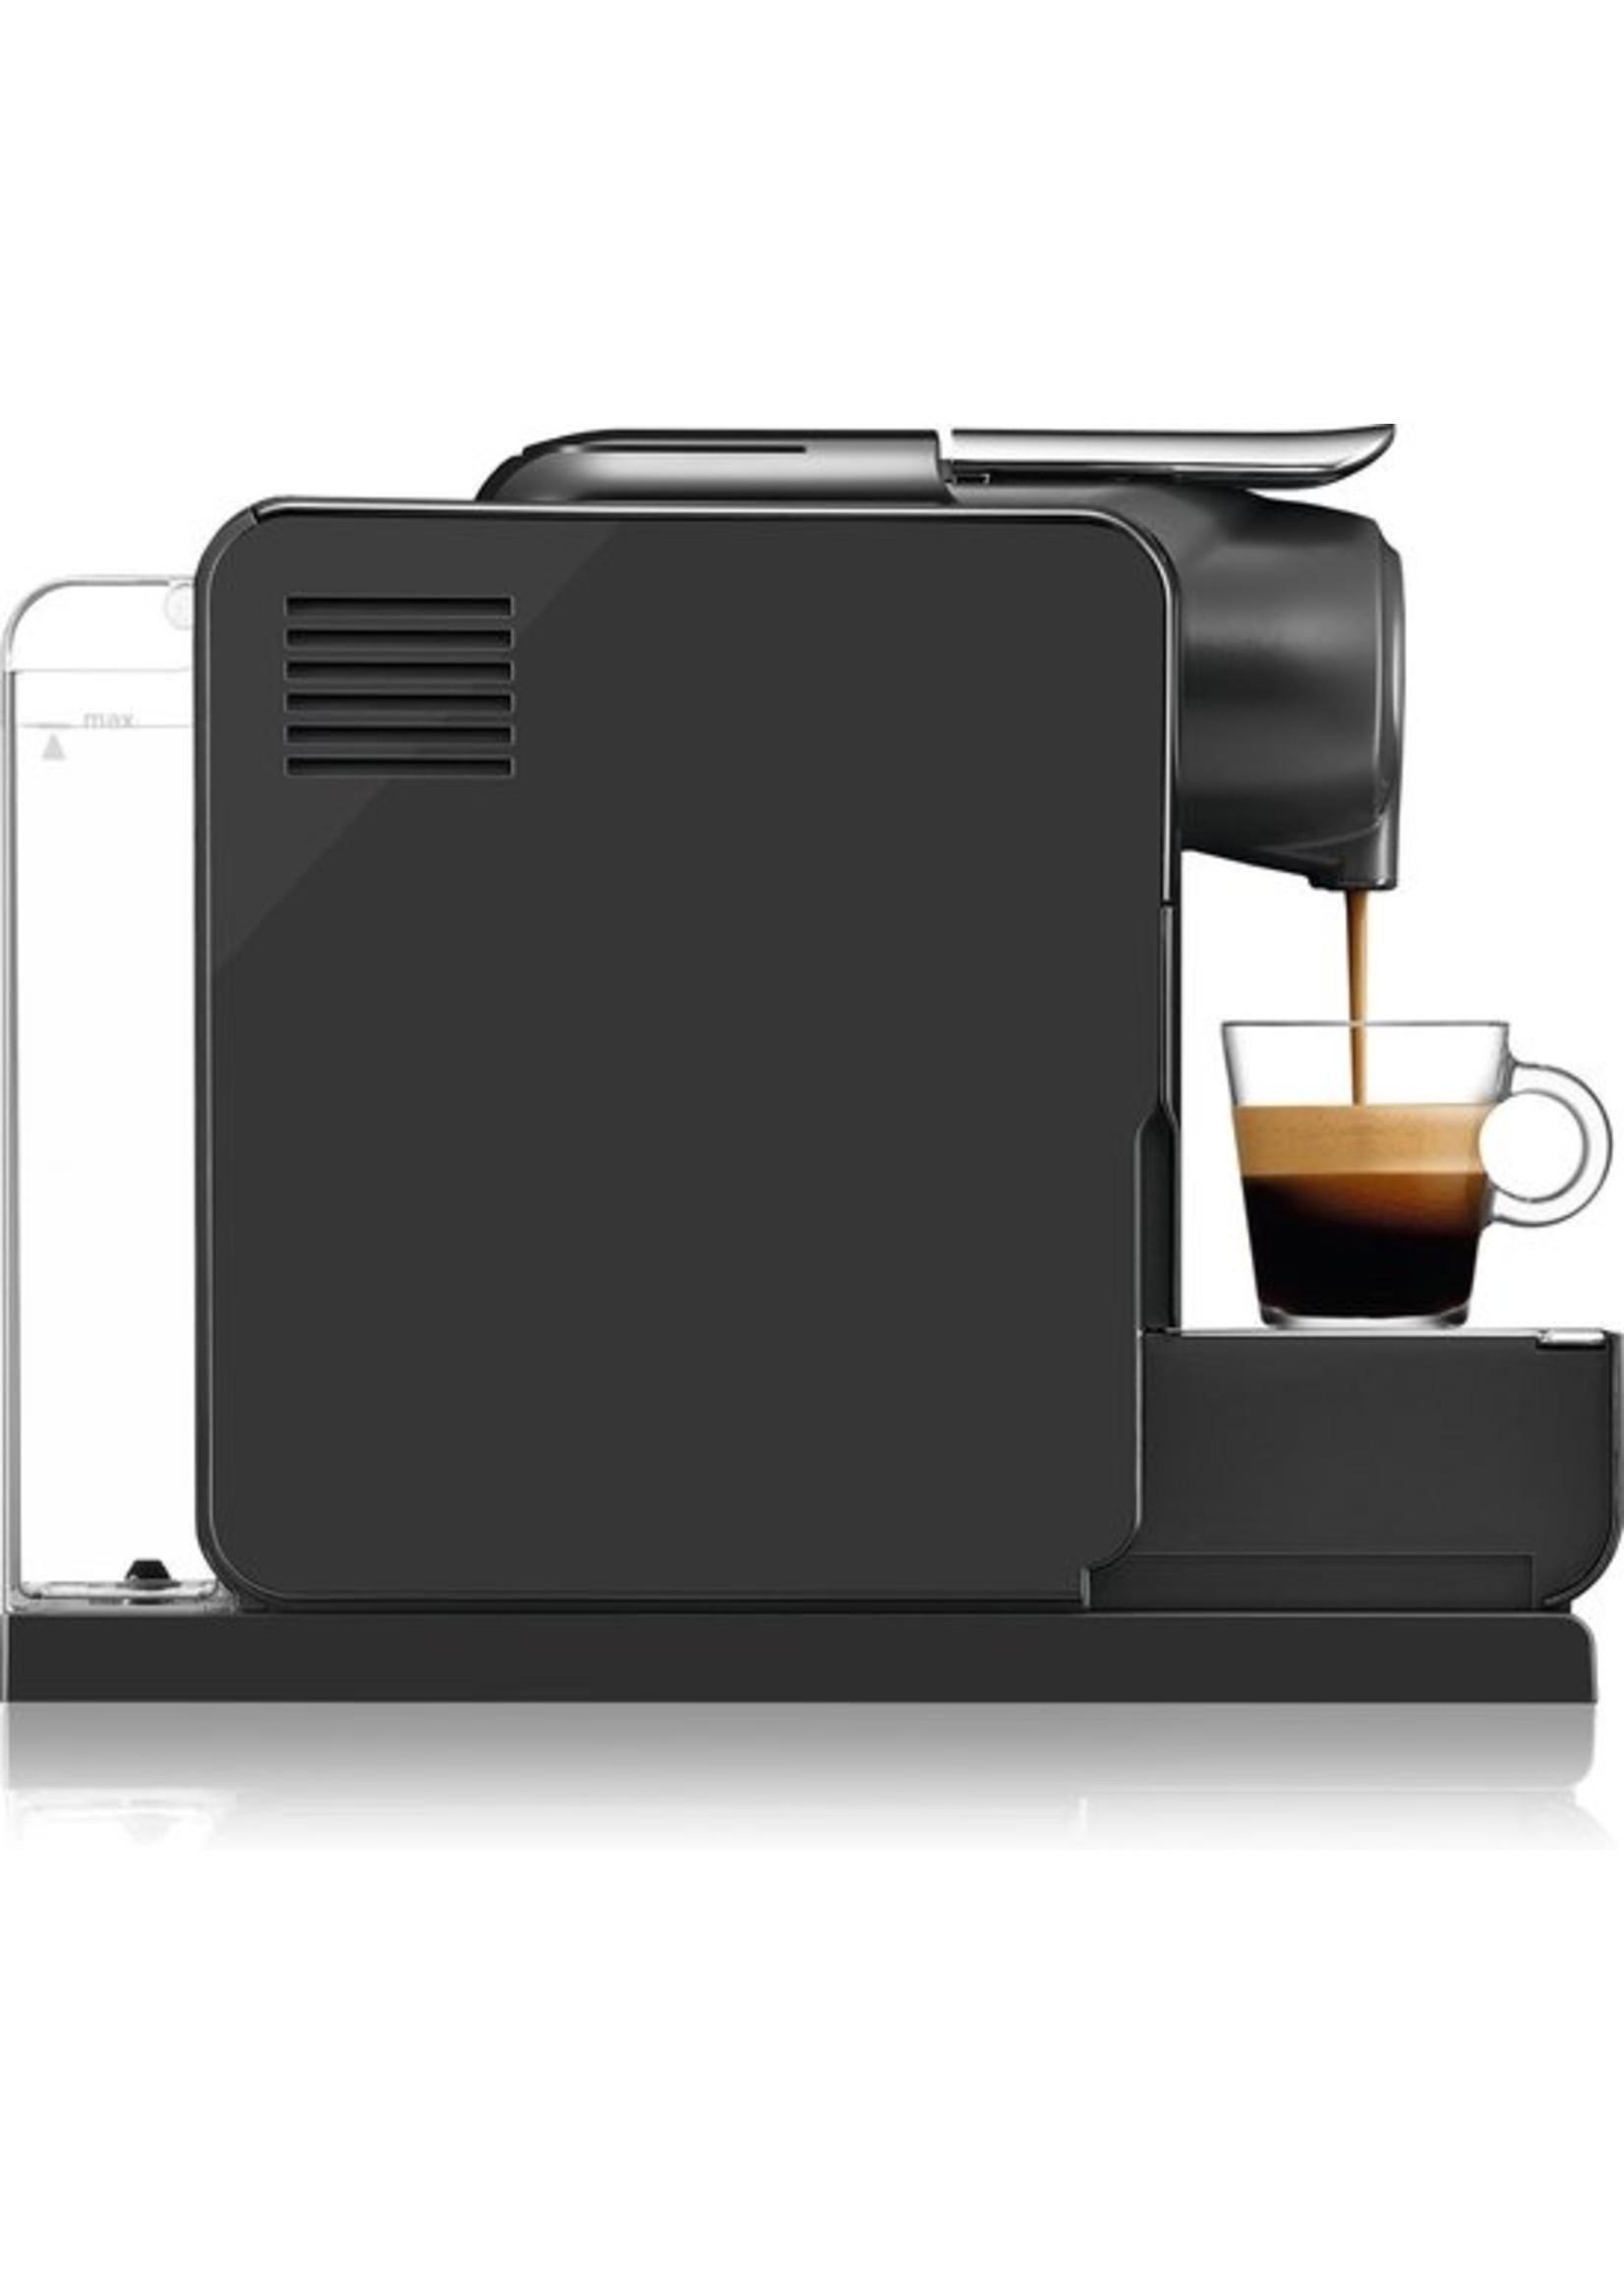 DeLonghi Nespresso De'Longhi Lattissima Touch EN560.B - Koffiecupmachine - Antraciet